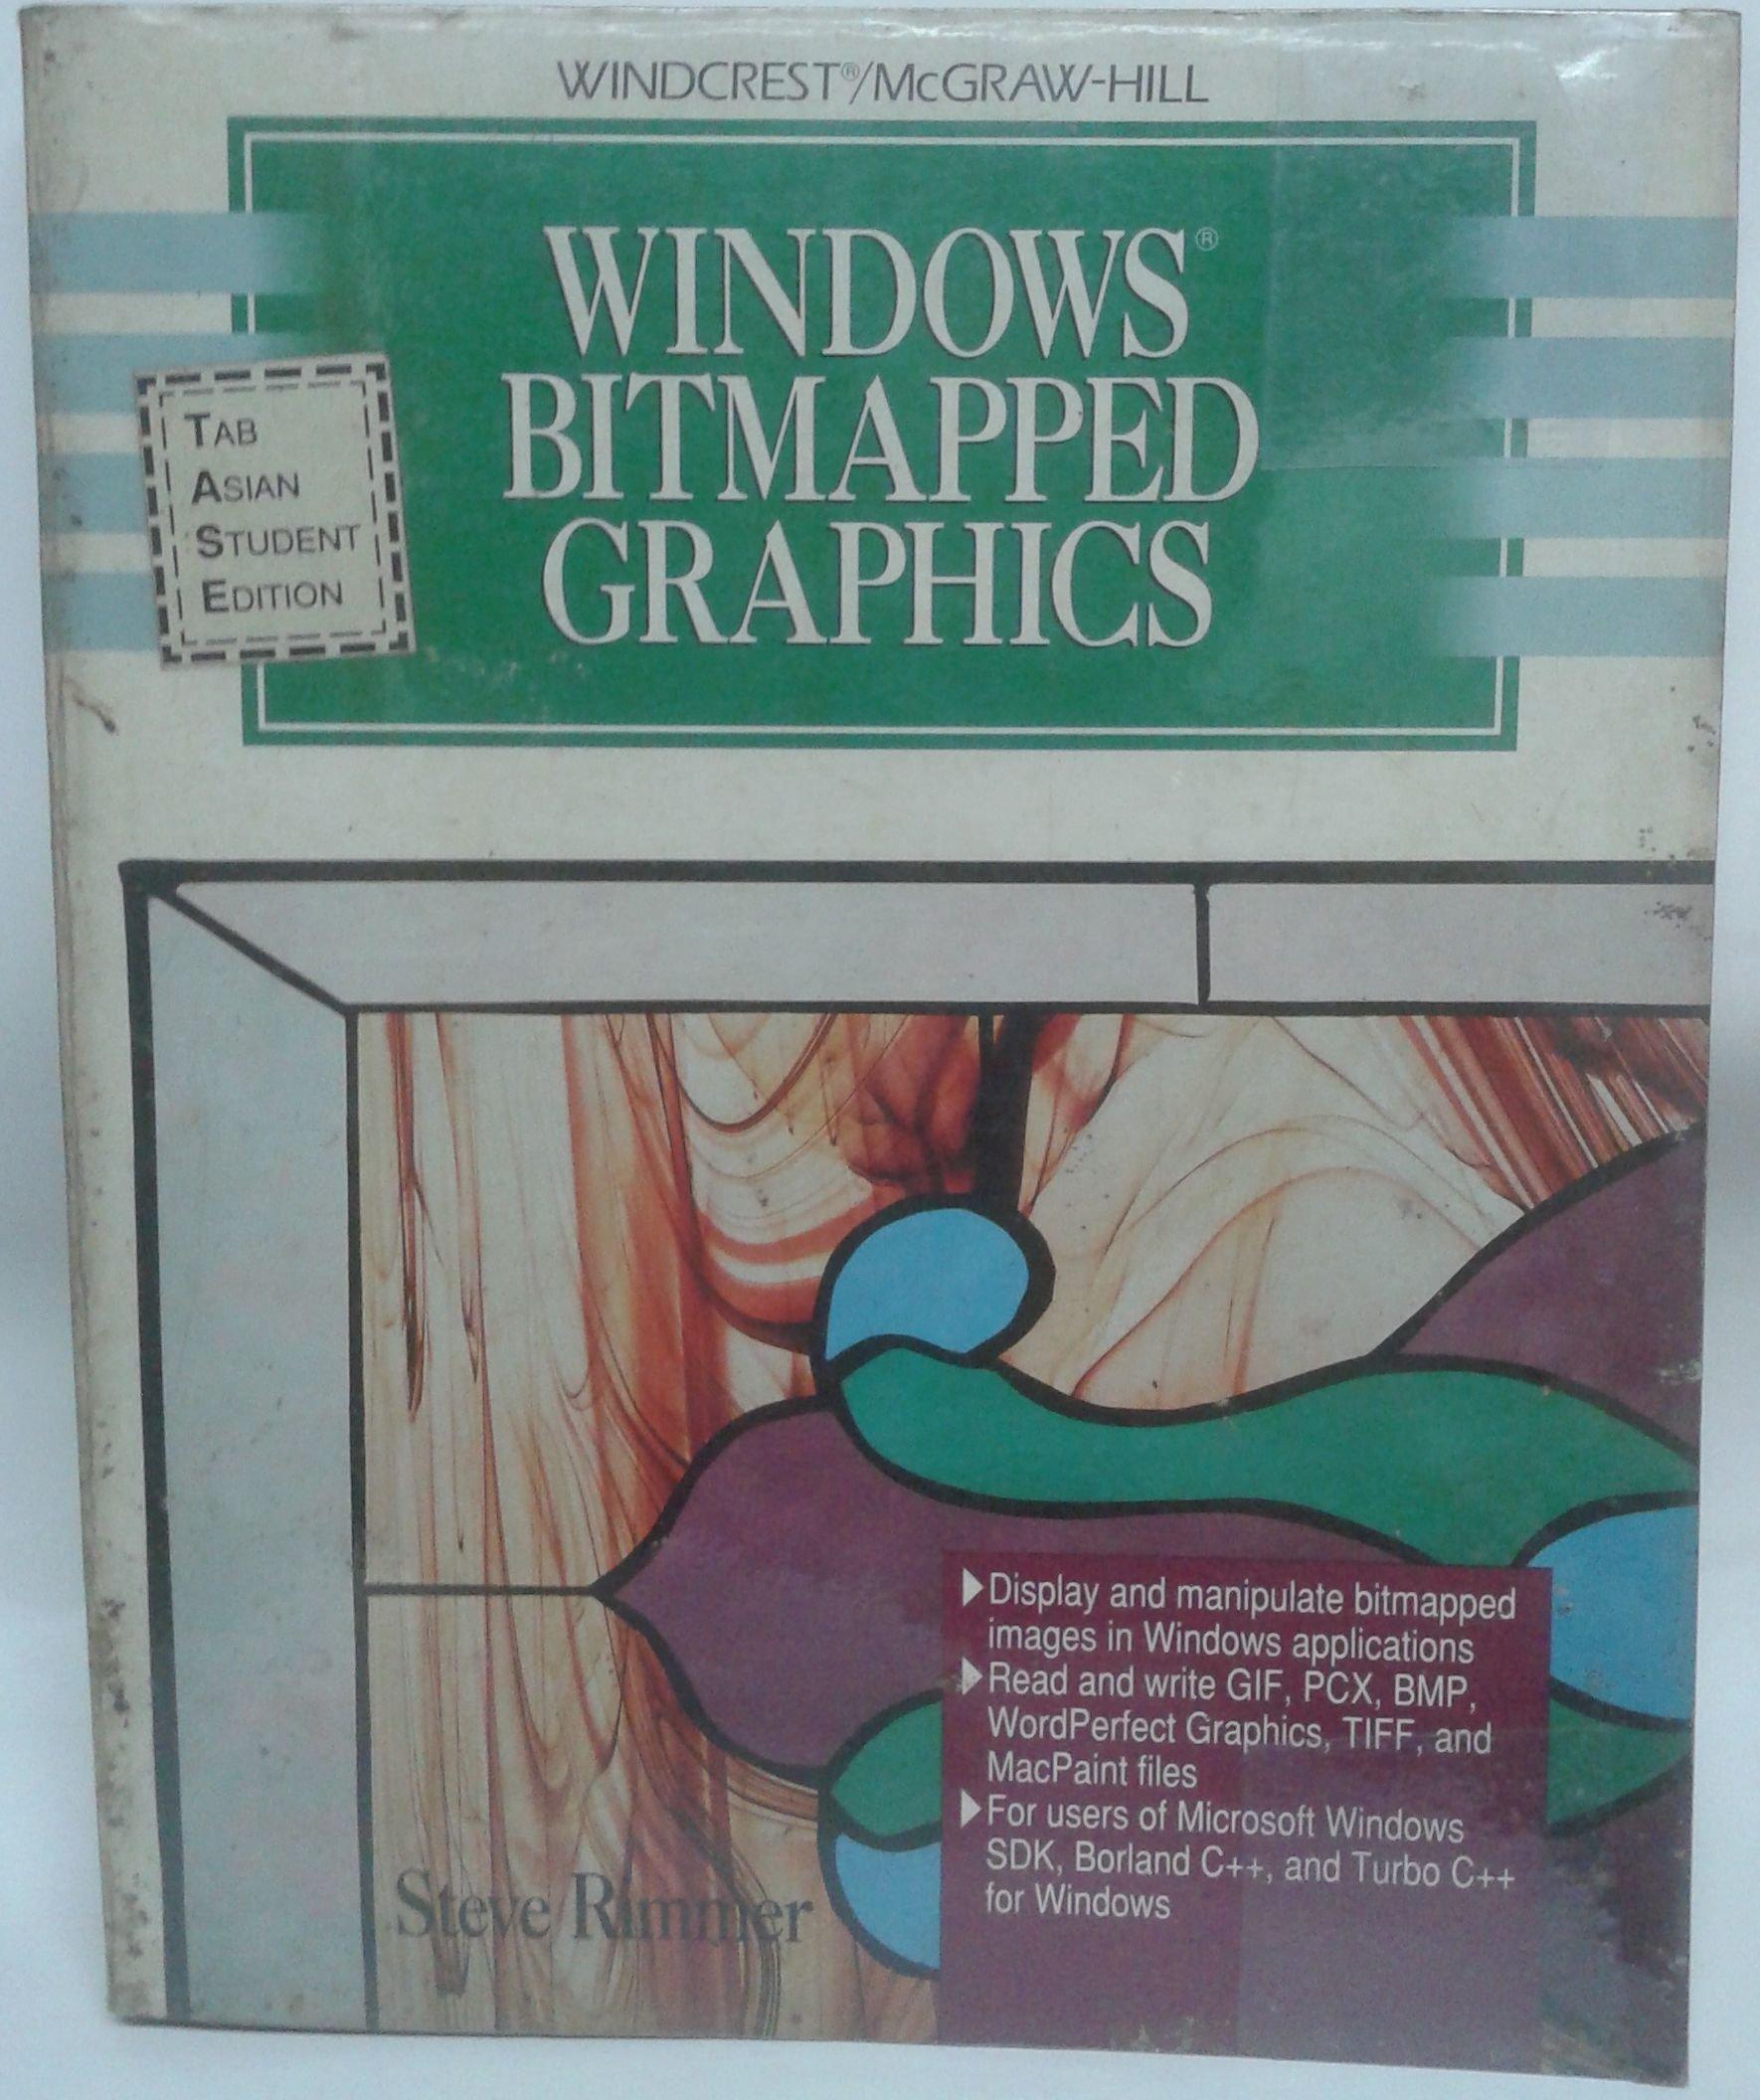 Windows Bitmapped Graphics: Amazon.es: Steven William Rimmer: Libros en idiomas extranjeros